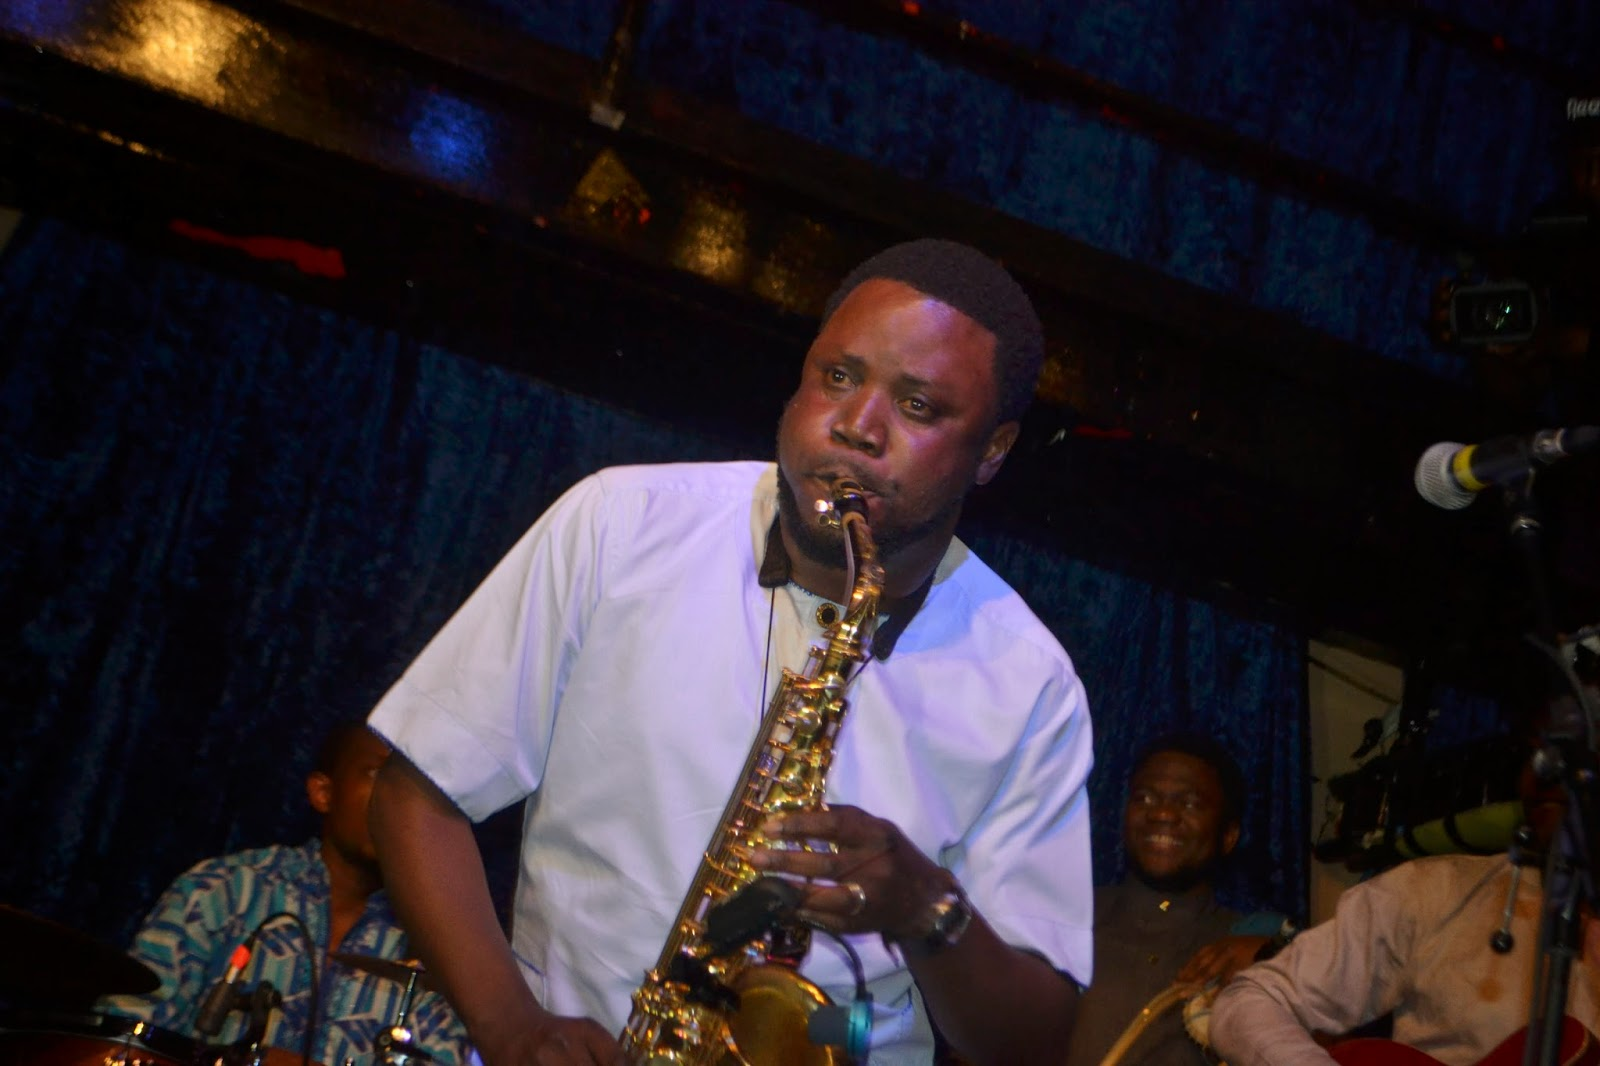 Mike Aremu on his sax